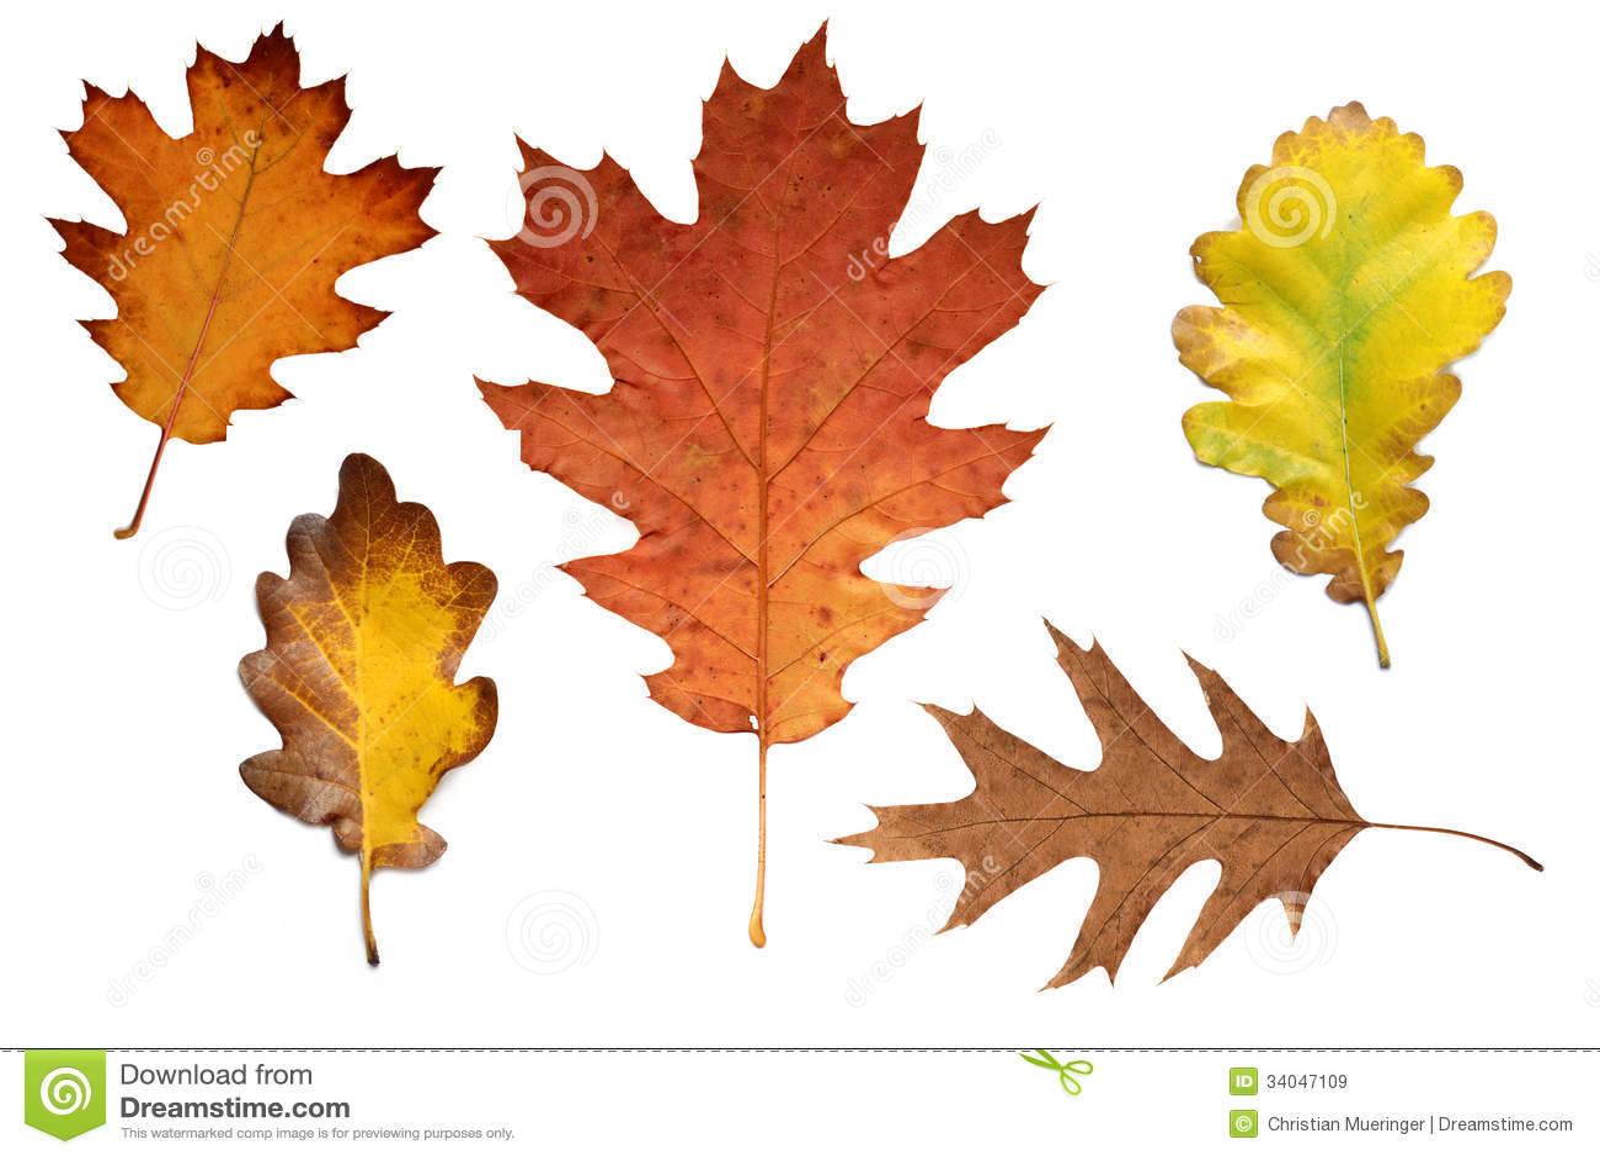 Various - Autumn Leaves